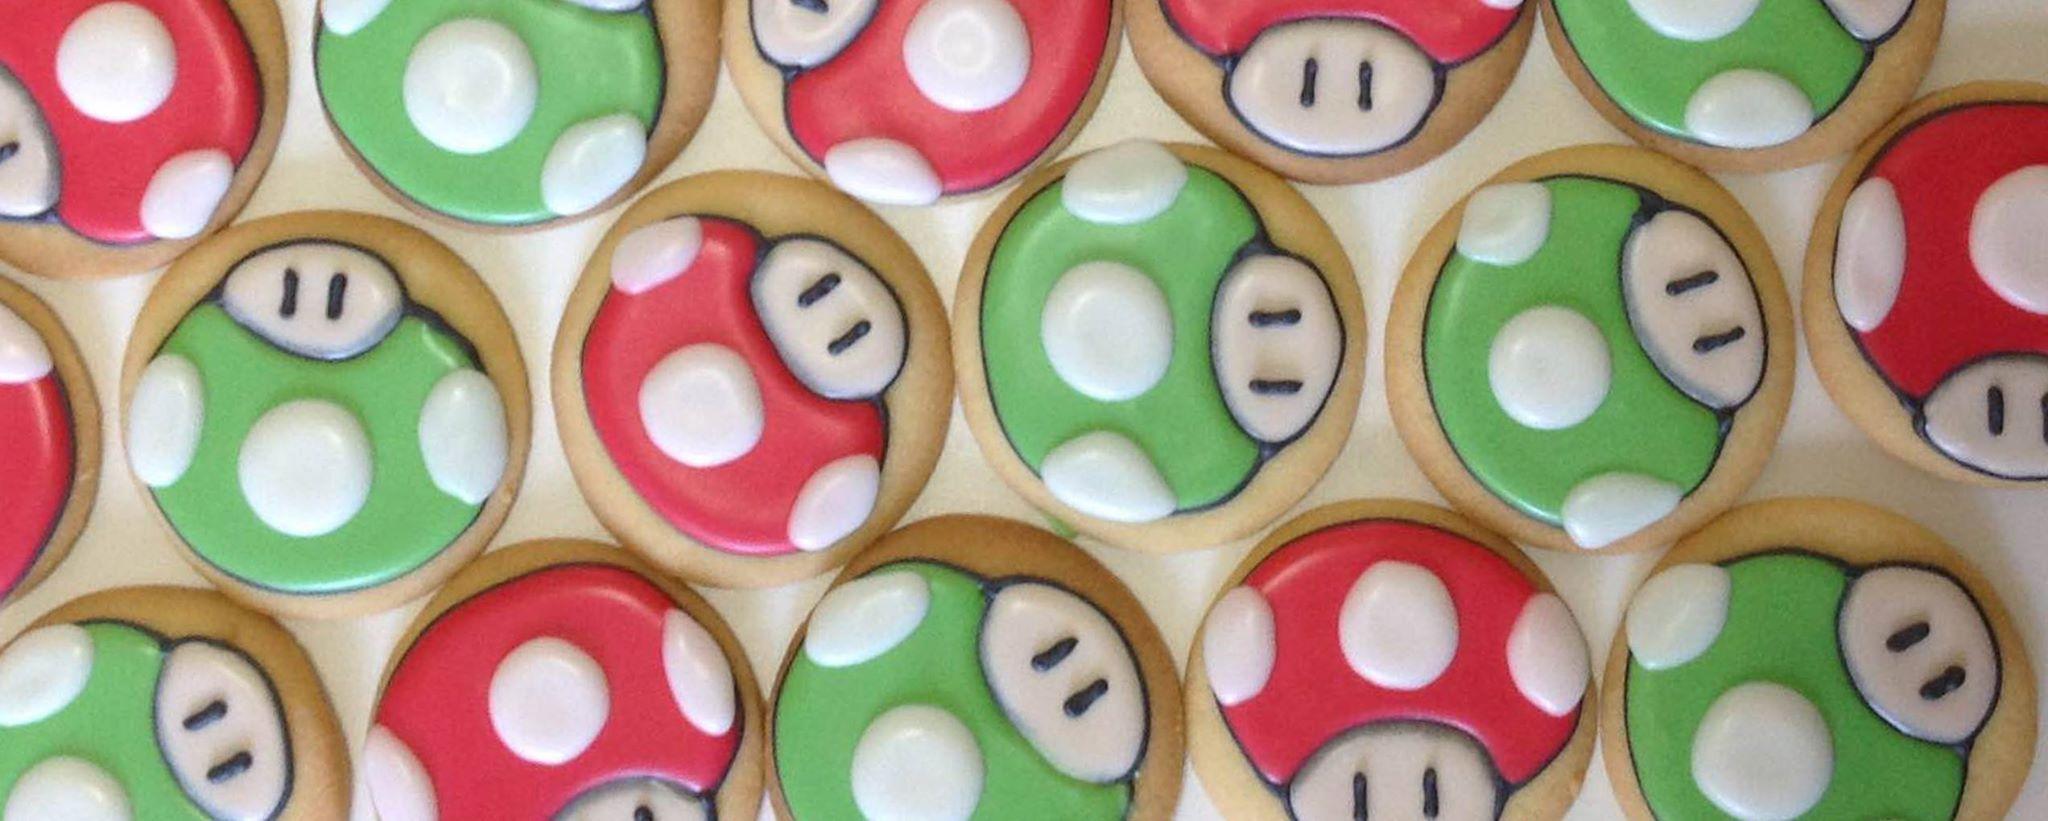 Mario's Mushroom Cookies